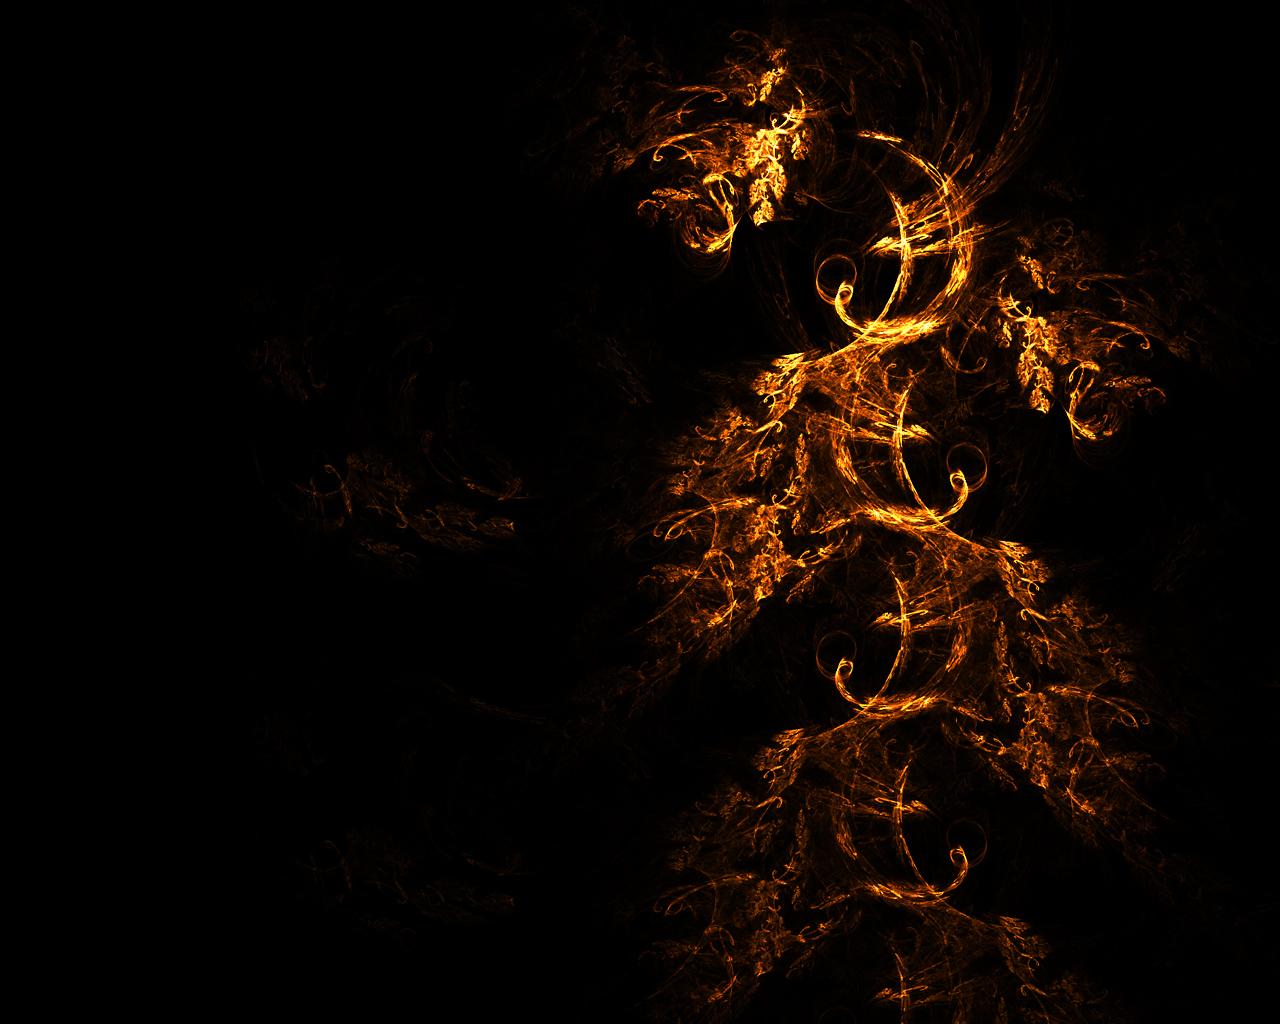 Gold leaf by ji owon on deviantart gold leaf by ji owon toneelgroepblik Images